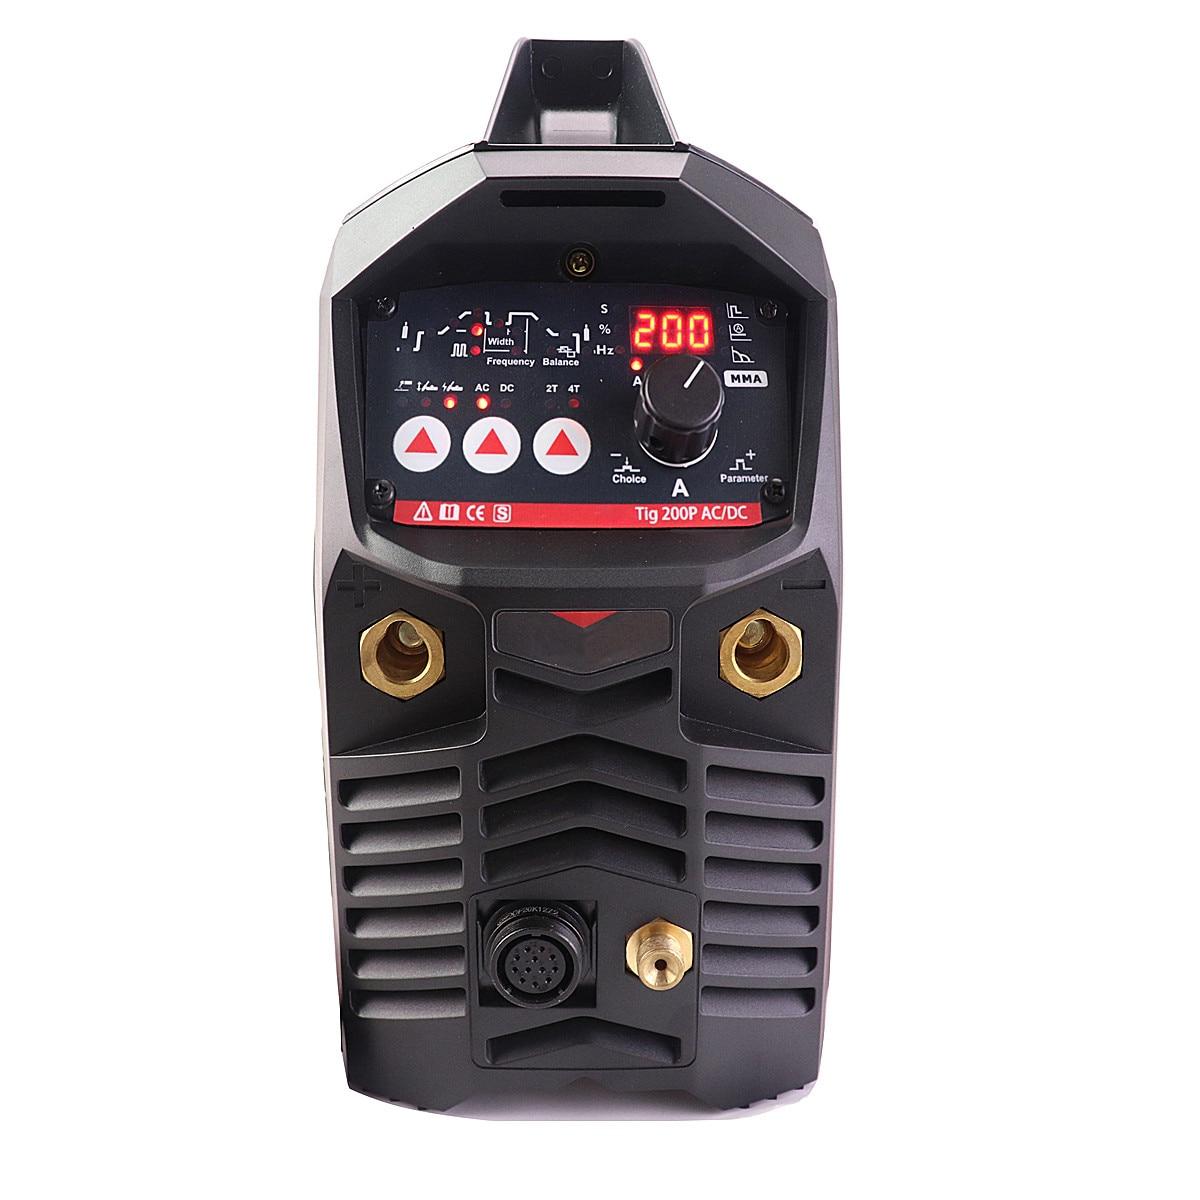 Digital Approved 200A Machine TIG TIG Welding Machine AC DC Professional ACDC Pulse Aluminium TIG Welder CE Welding Pulse MMA